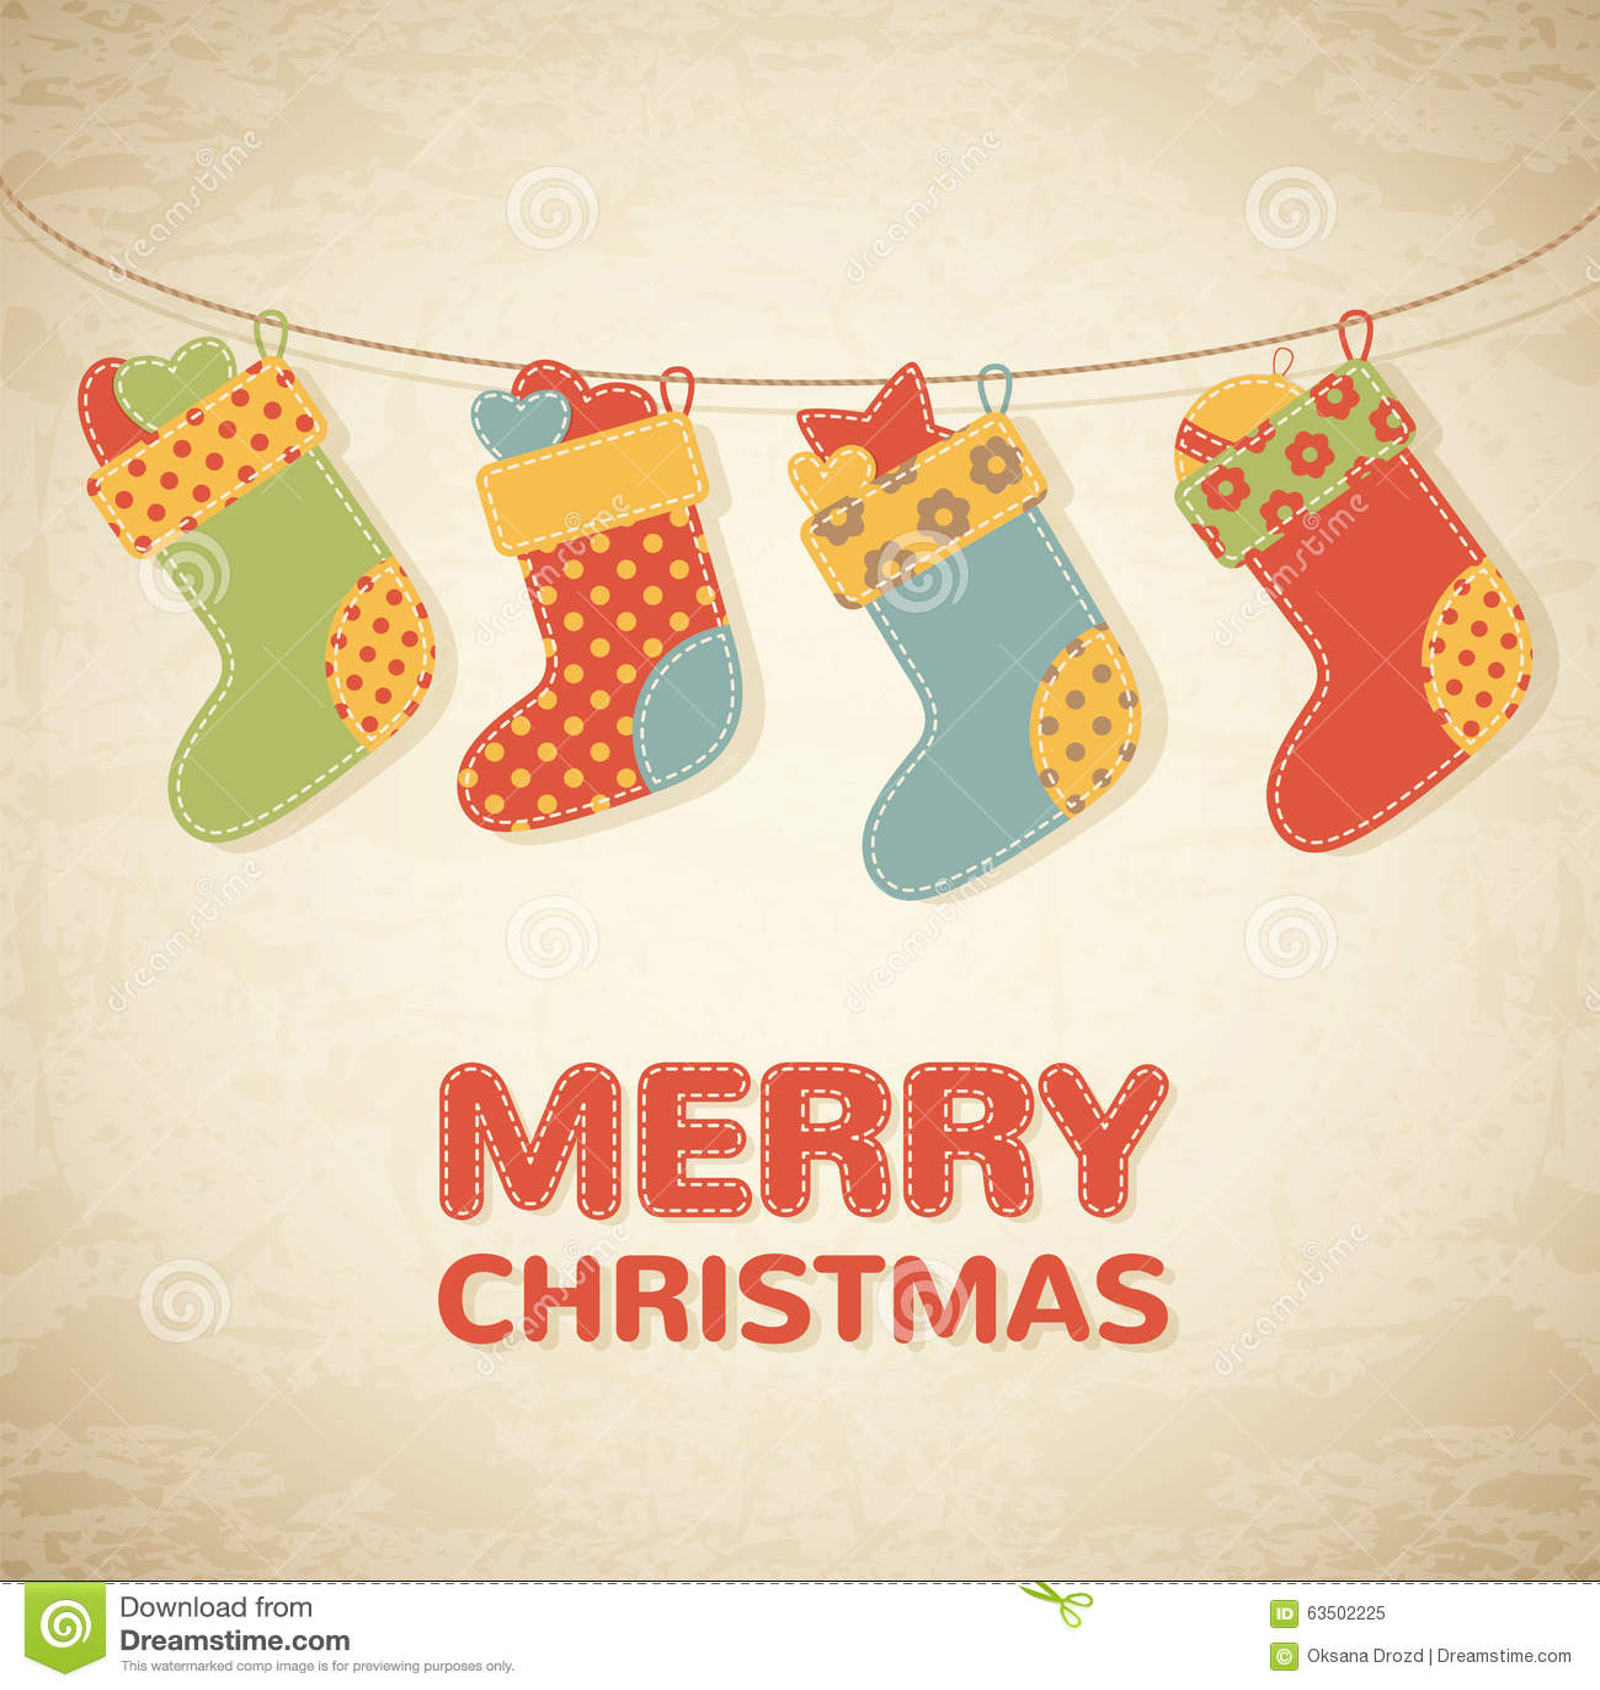 Childish Christmas illustration with colorful stockings